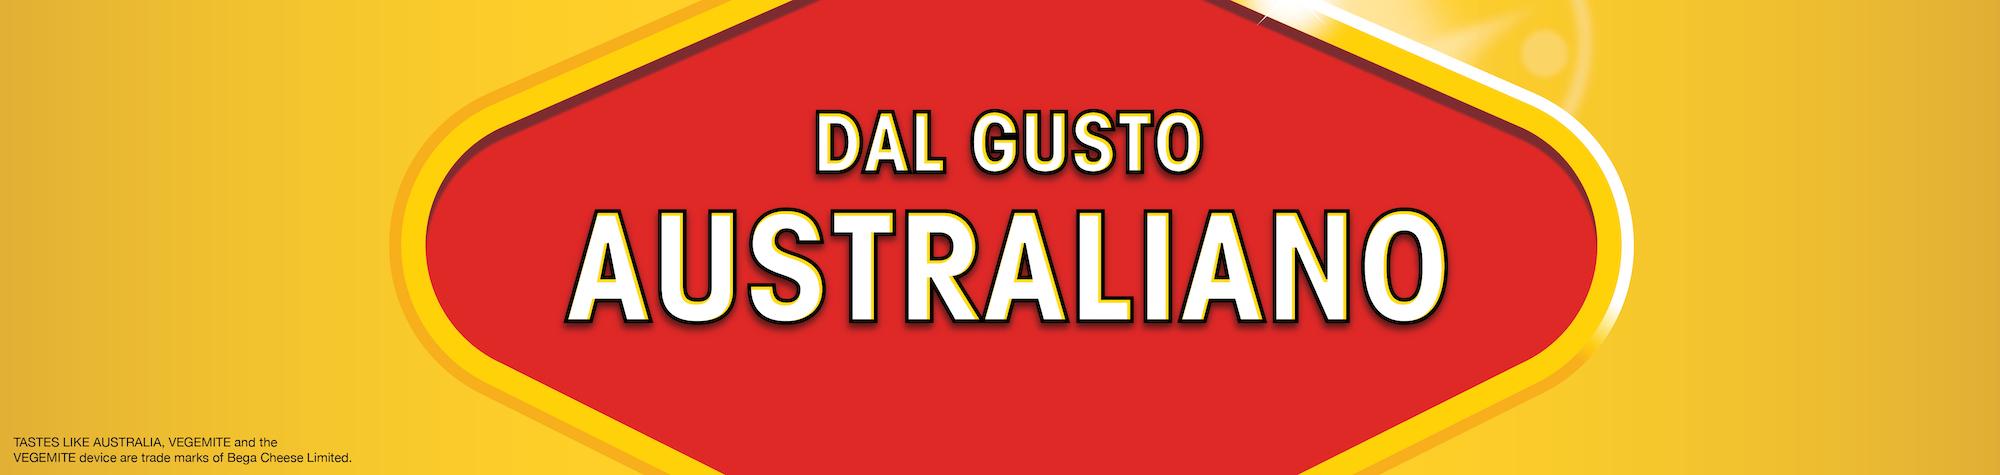 Vegemite's new outdoor campaign celebrates Australia's diversity for Harmony Week